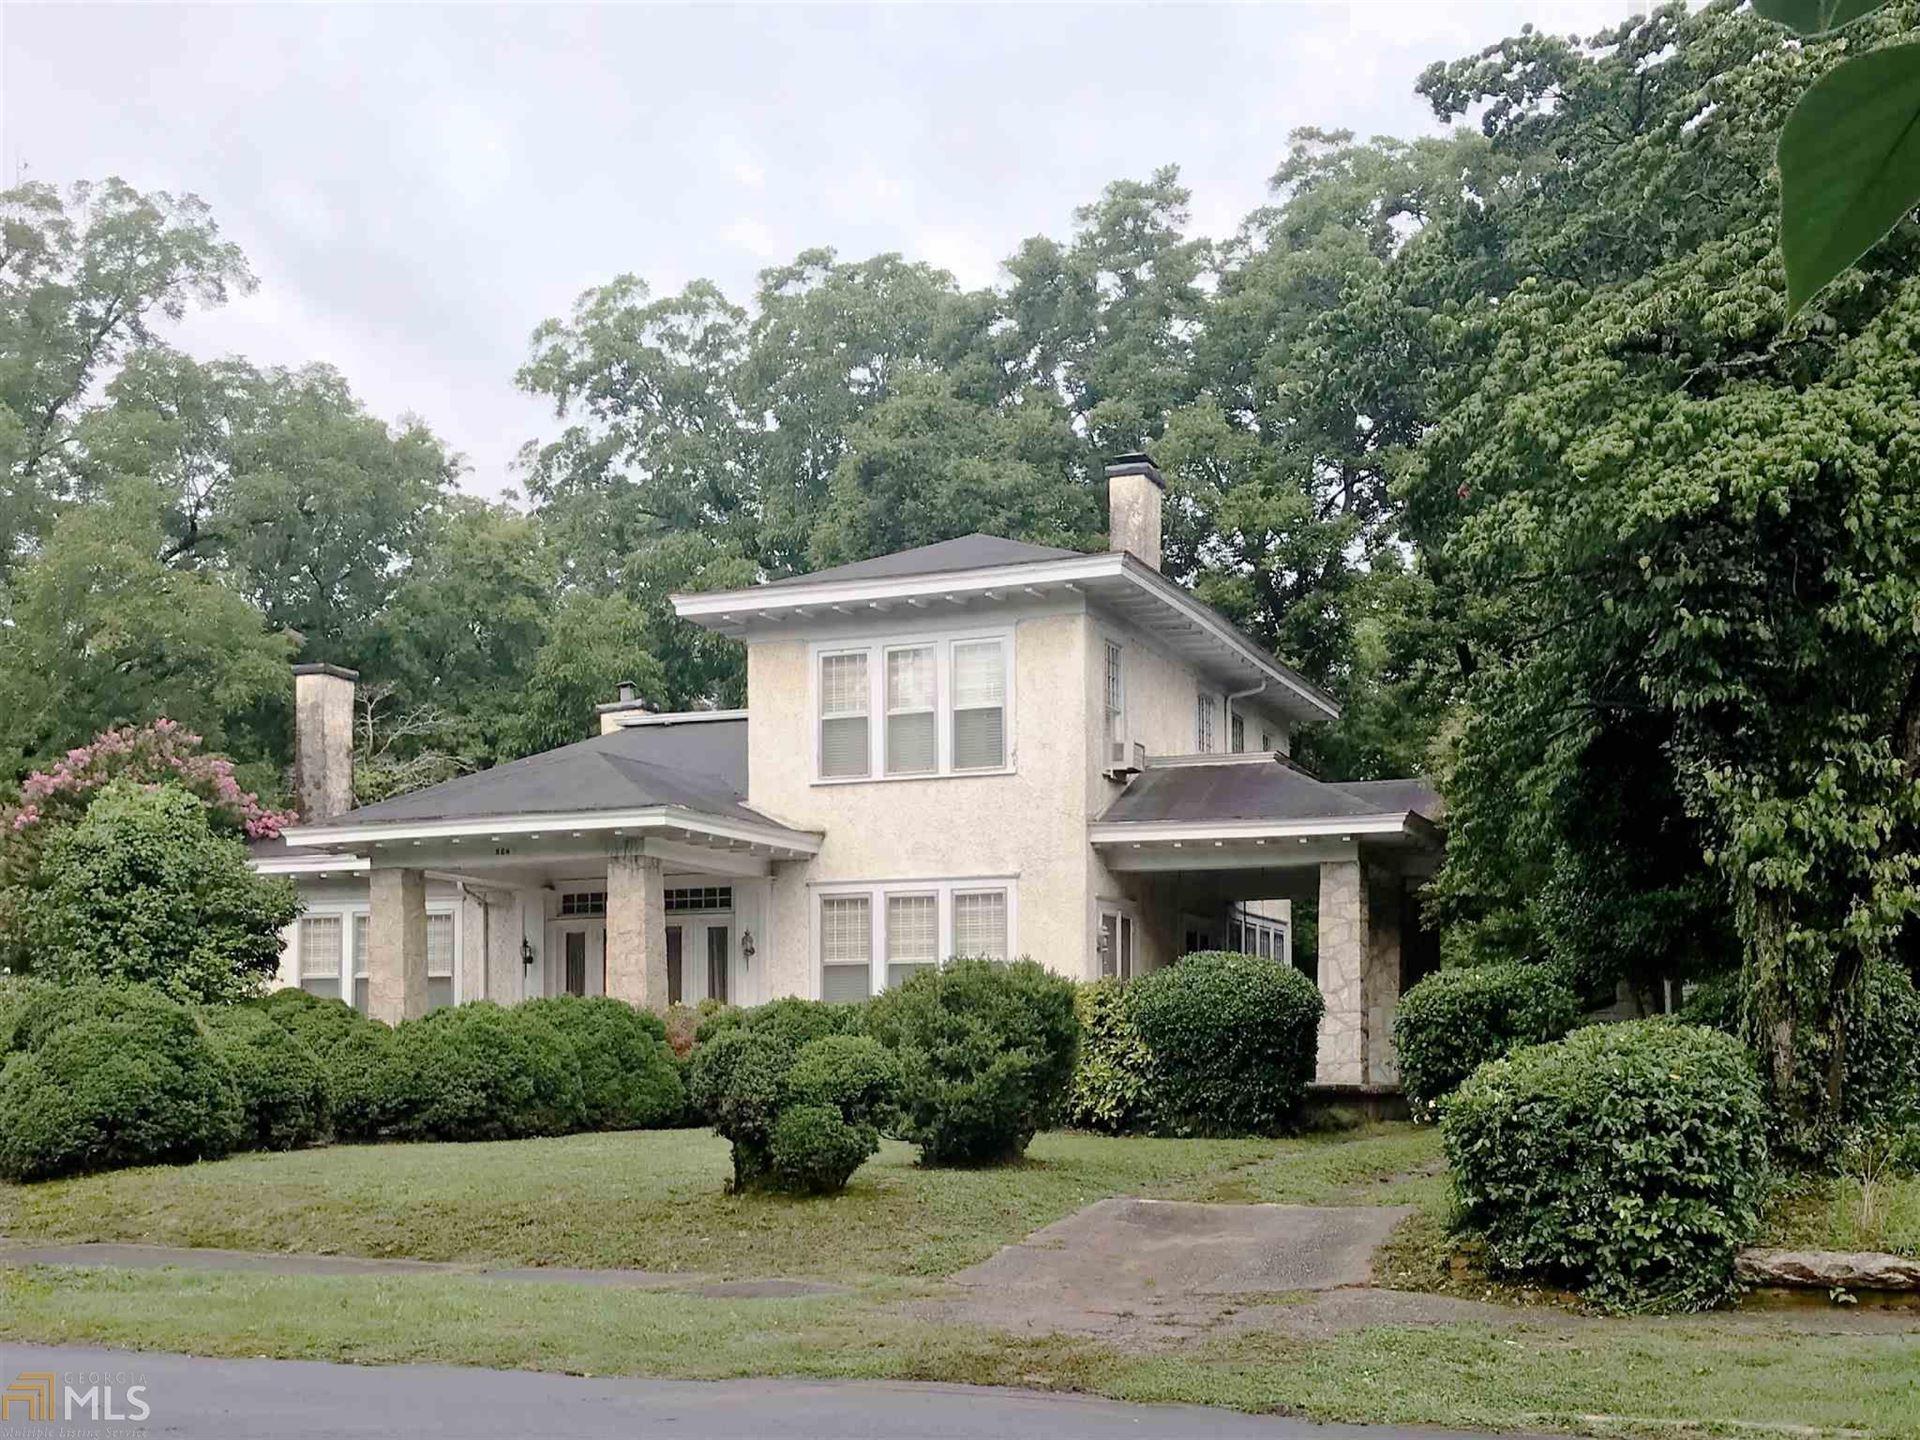 509 College St, Monticello, GA 31064 - MLS#: 8811229